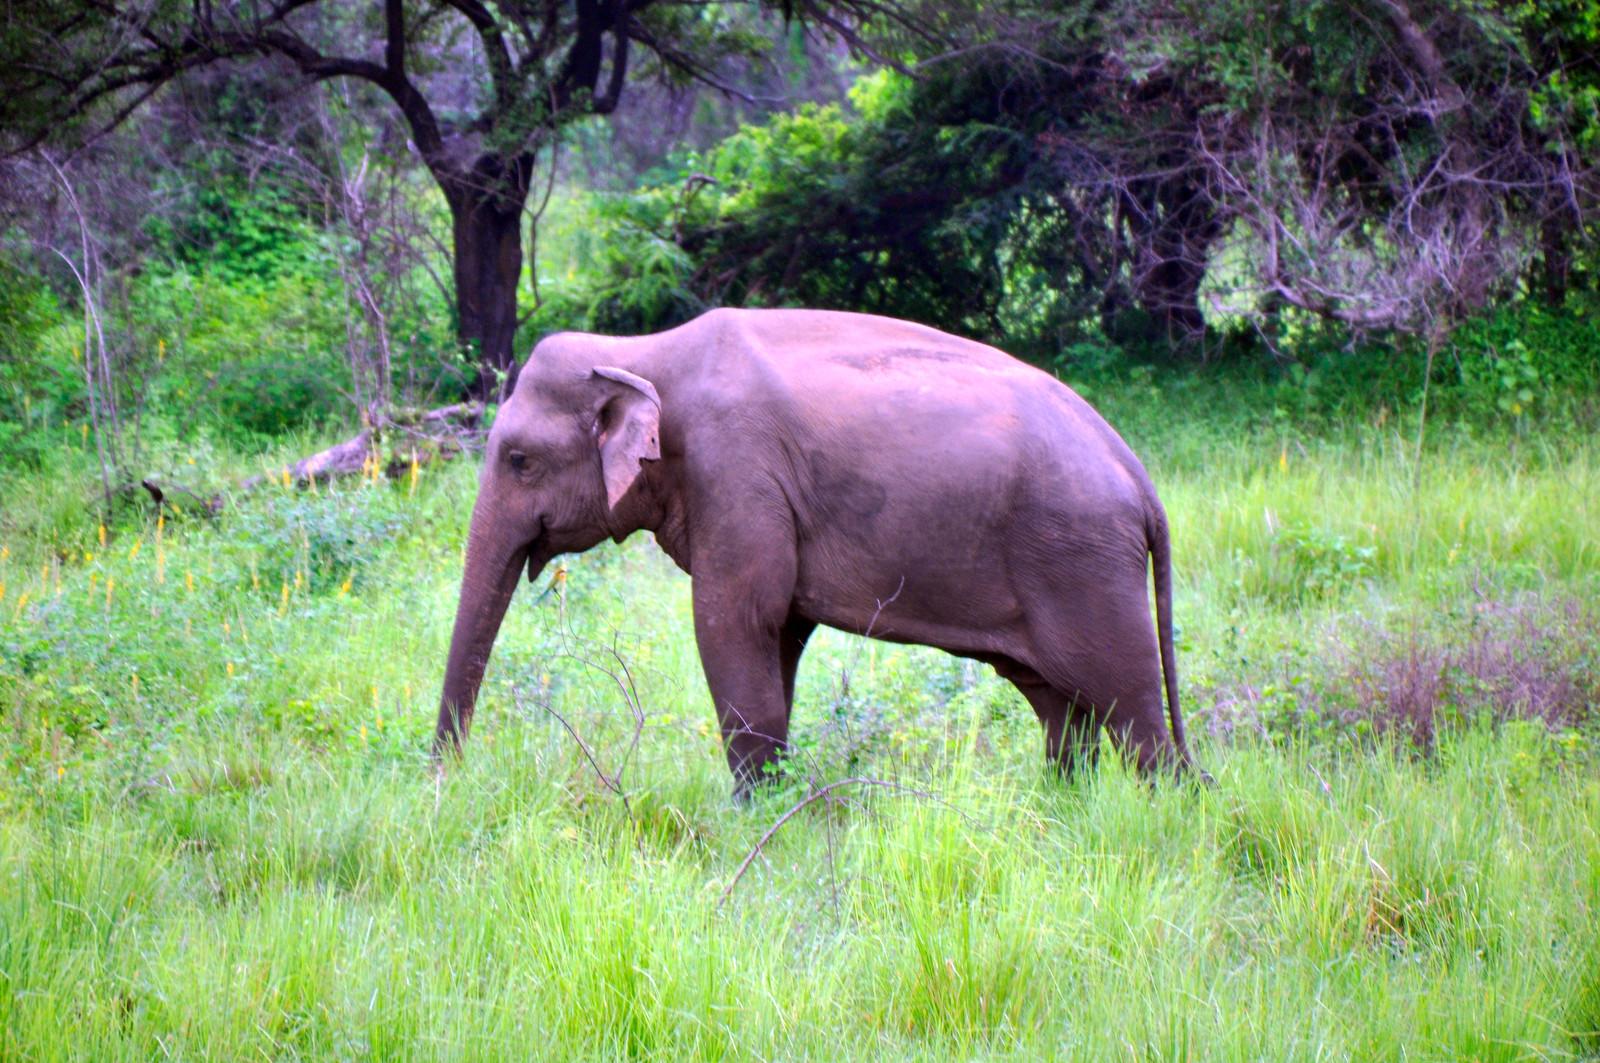 VER ELEFANTES SALVAJES EN SRI LANKA ver elefantes salvajes en sri lanka - 32032828447 3caffcc8a2 h - Ver elefantes salvajes en Sri Lanka